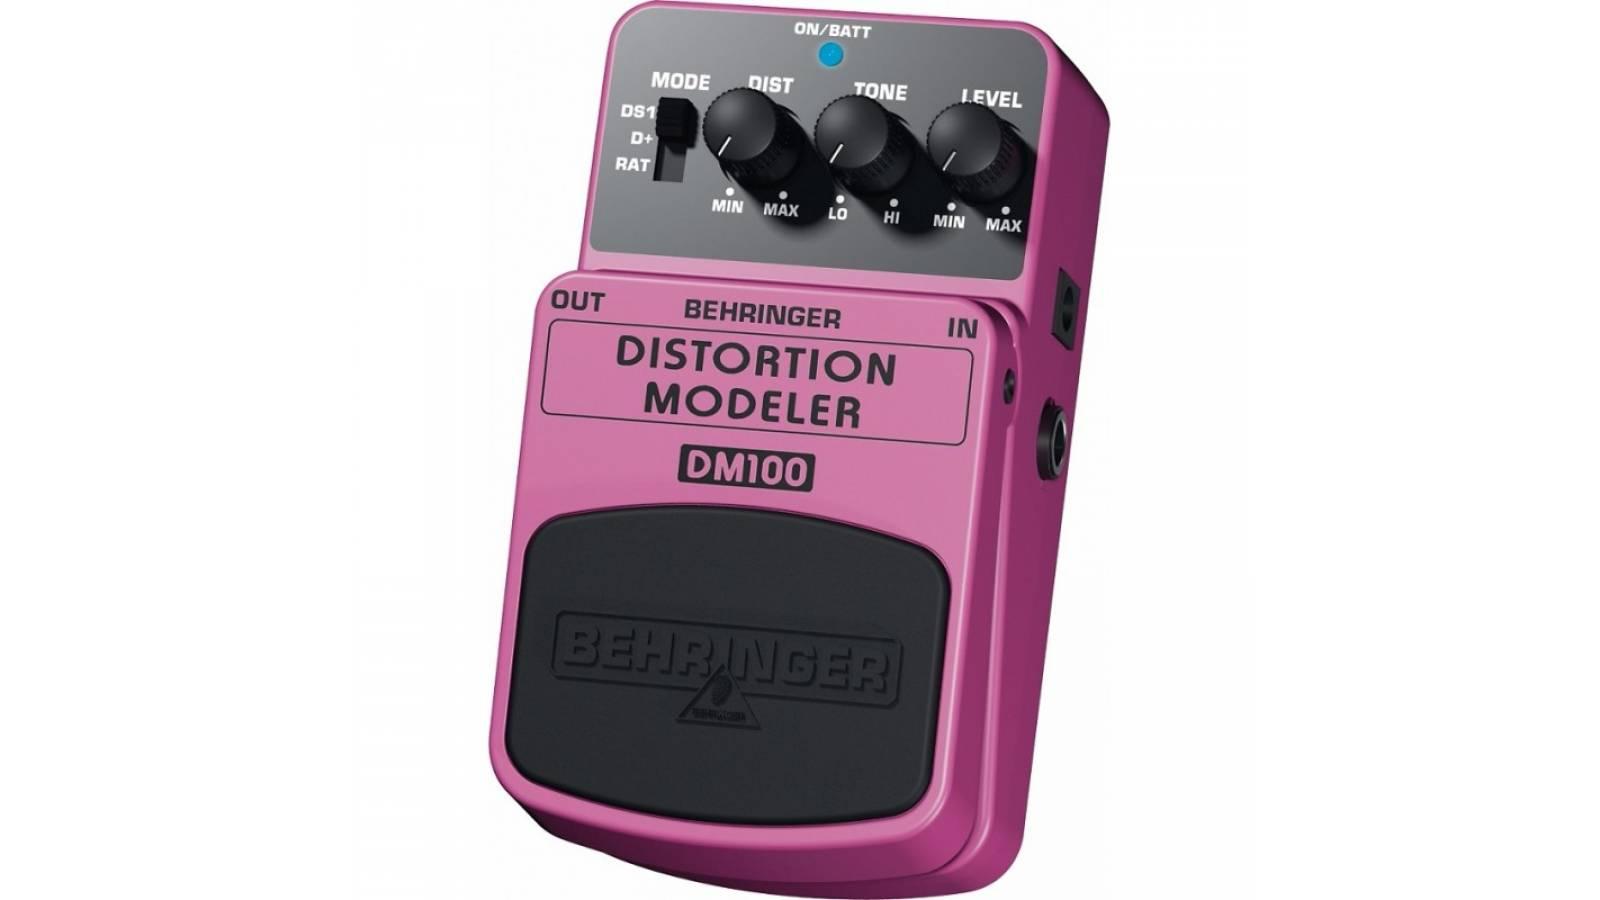 Pedal De Efectos para Guitara, Distortion Modeler Behringer DM100